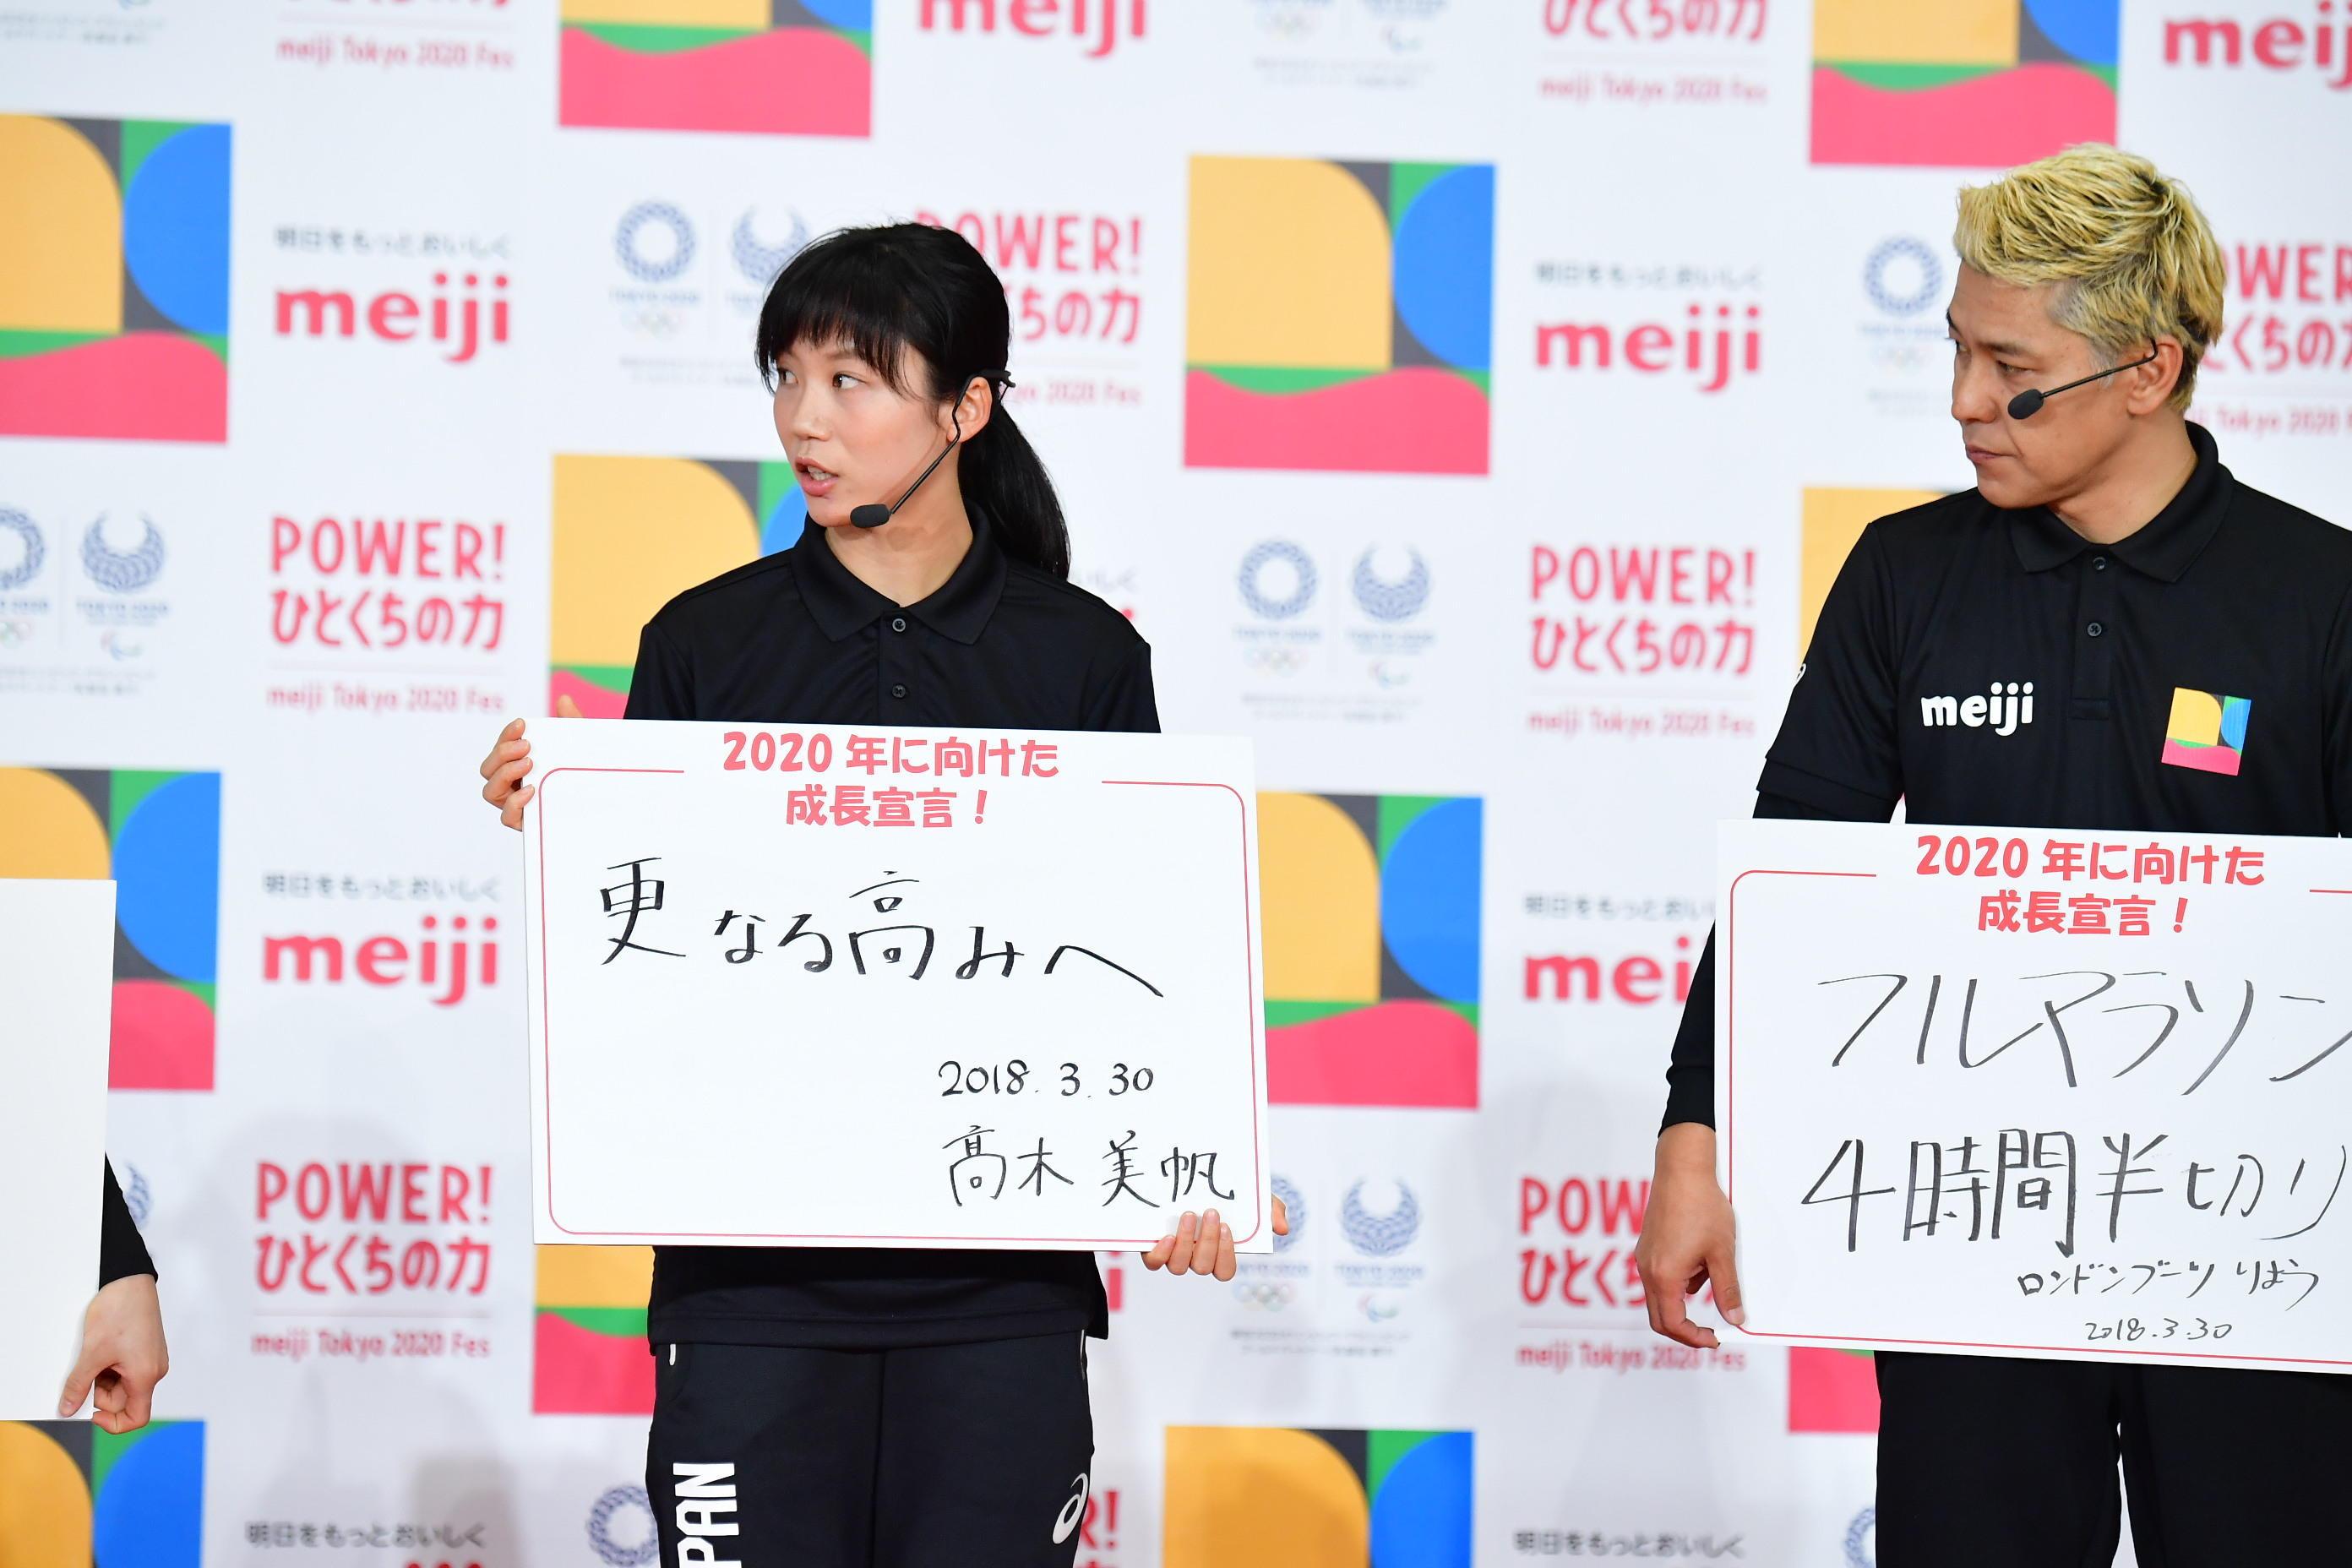 http://news.yoshimoto.co.jp/20180331010320-dbb36d78ab0b12e6d2c02e7fd6e3f651ac246c8b.jpg